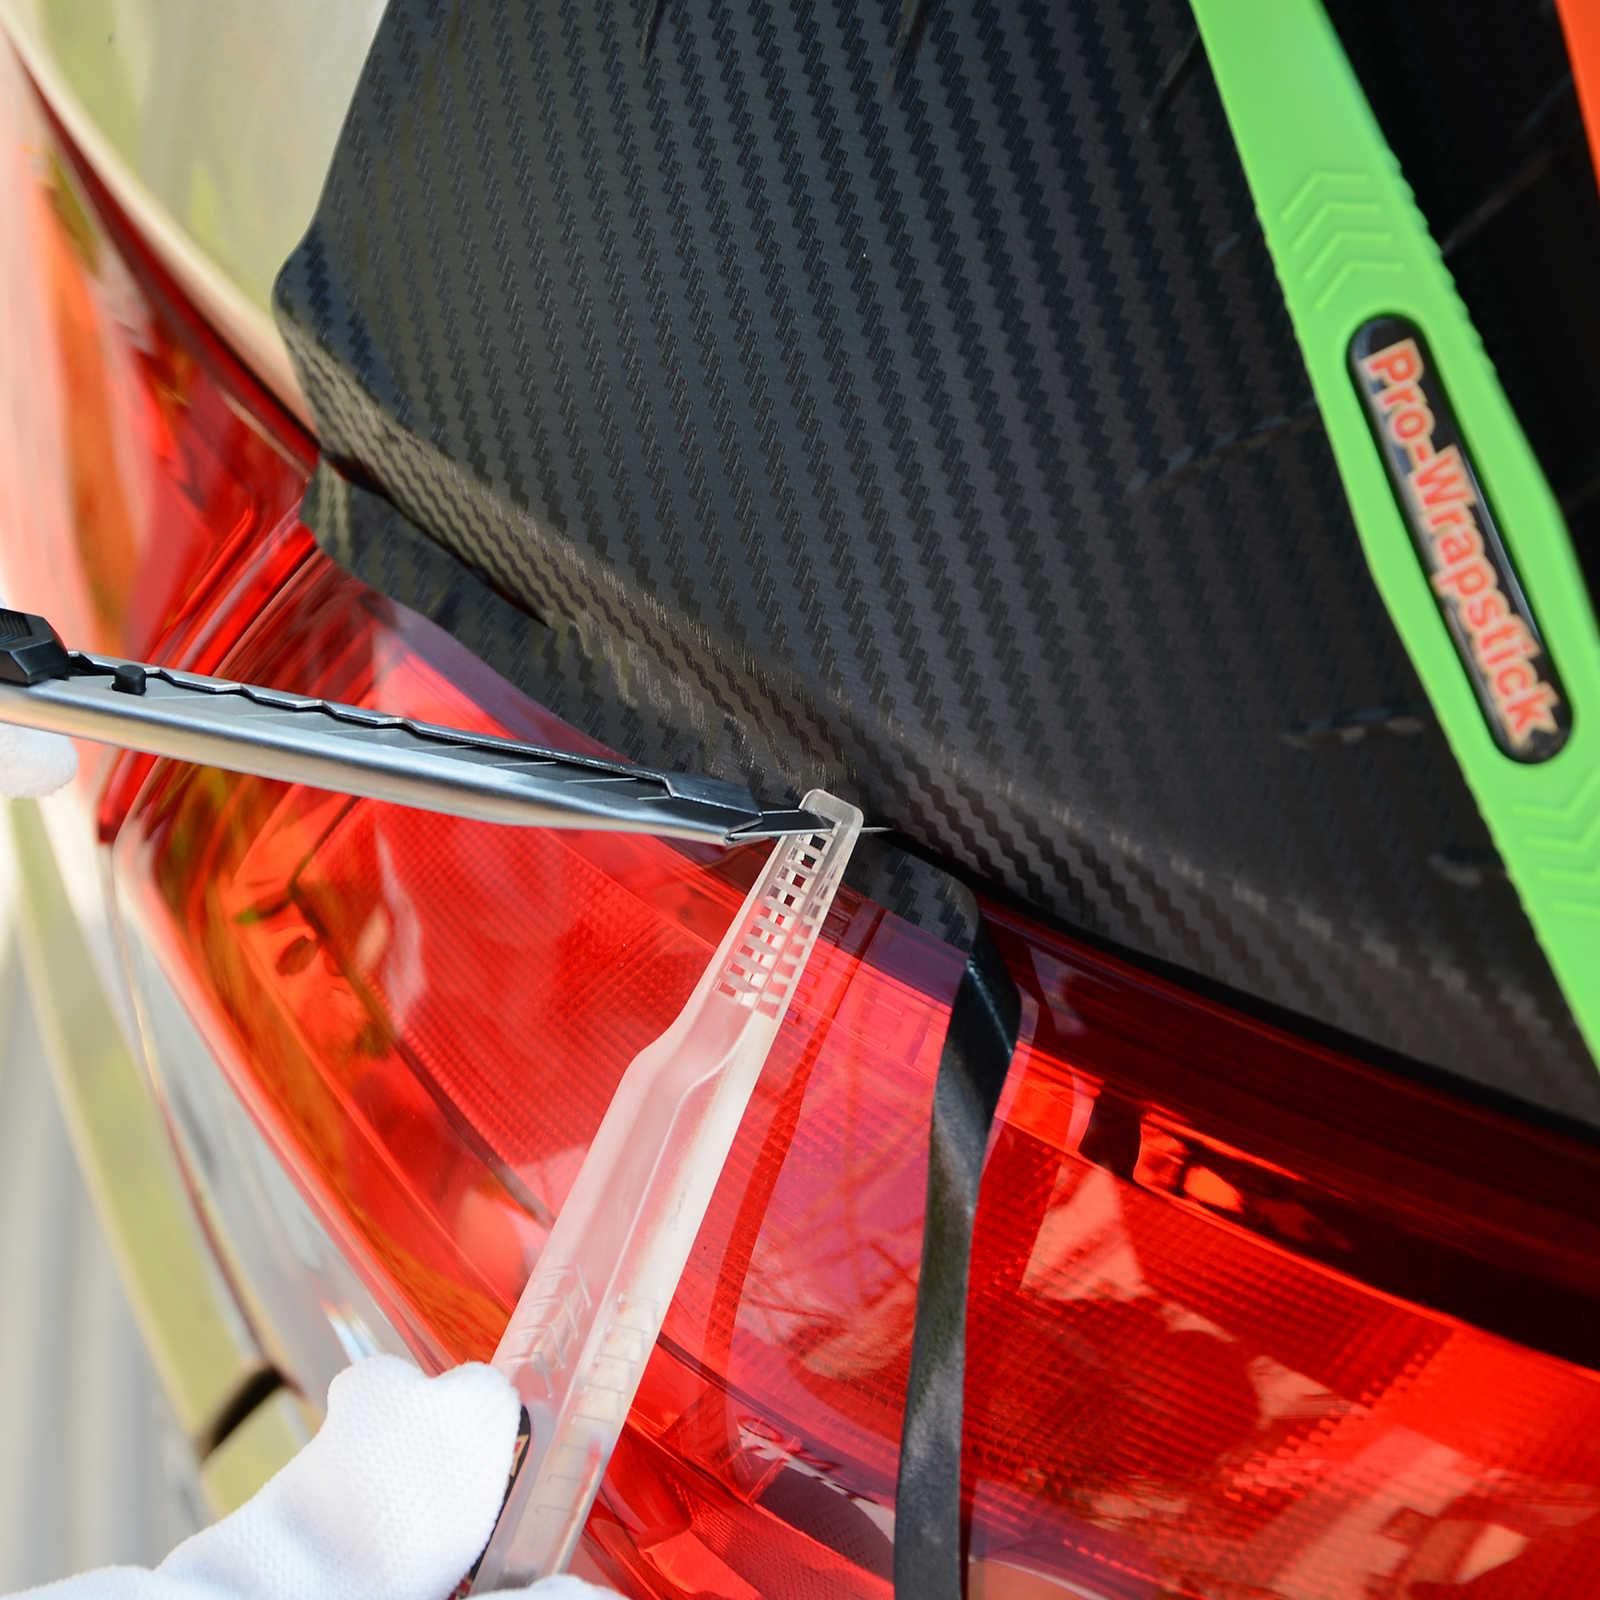 EHDIS, conjunto de espátula para Borde de esquina con imán de revestimiento para coche, accesorios para coche, pegatina de fibra de carbono, herramienta de envoltura, tinte de ventanilla